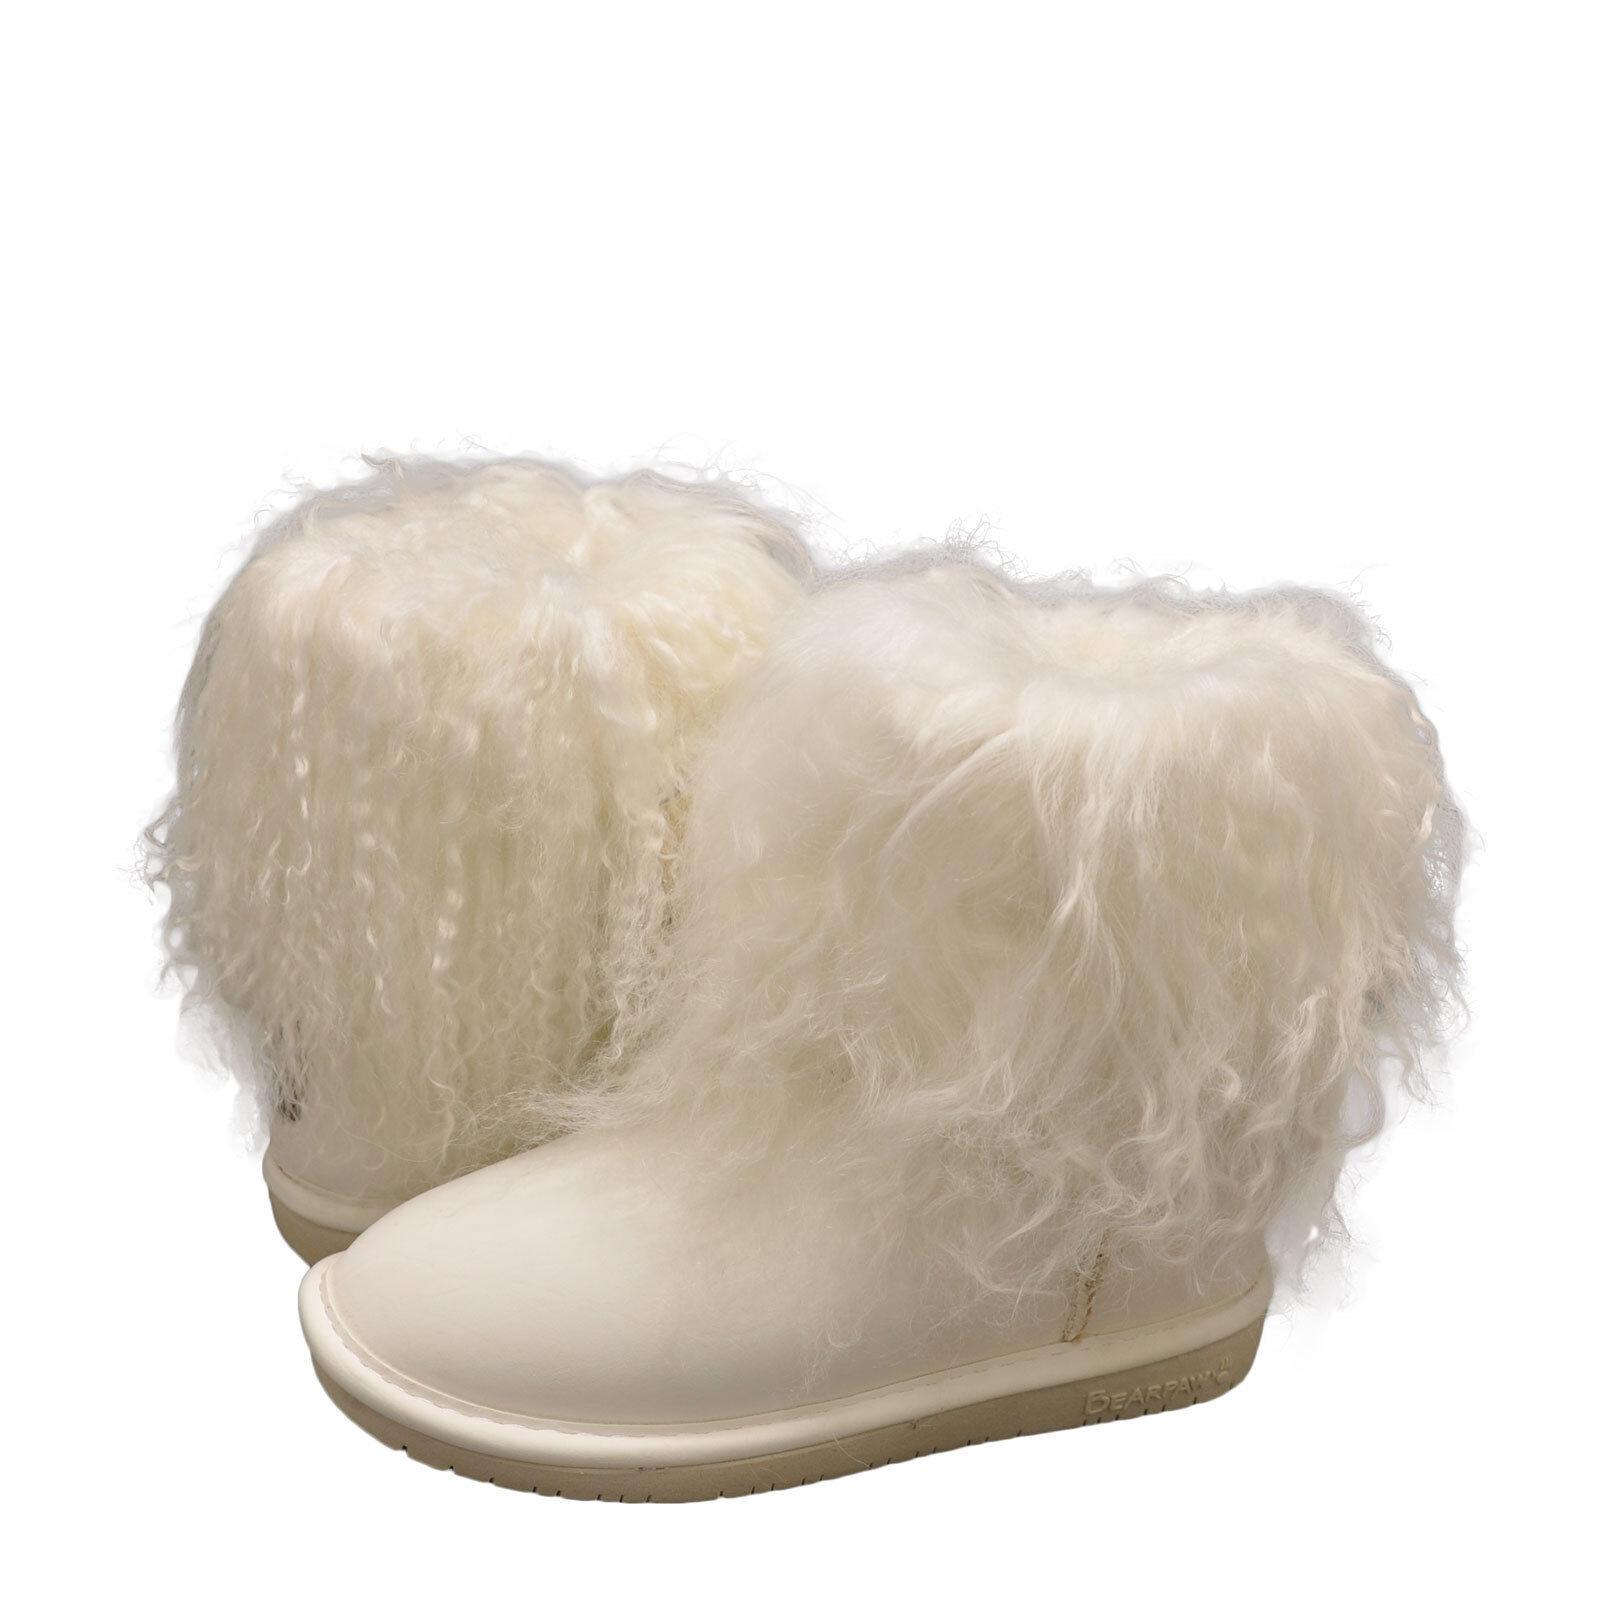 Women's Shoes Bearpaw Boo Furry Winter Booties 1854W White *New*